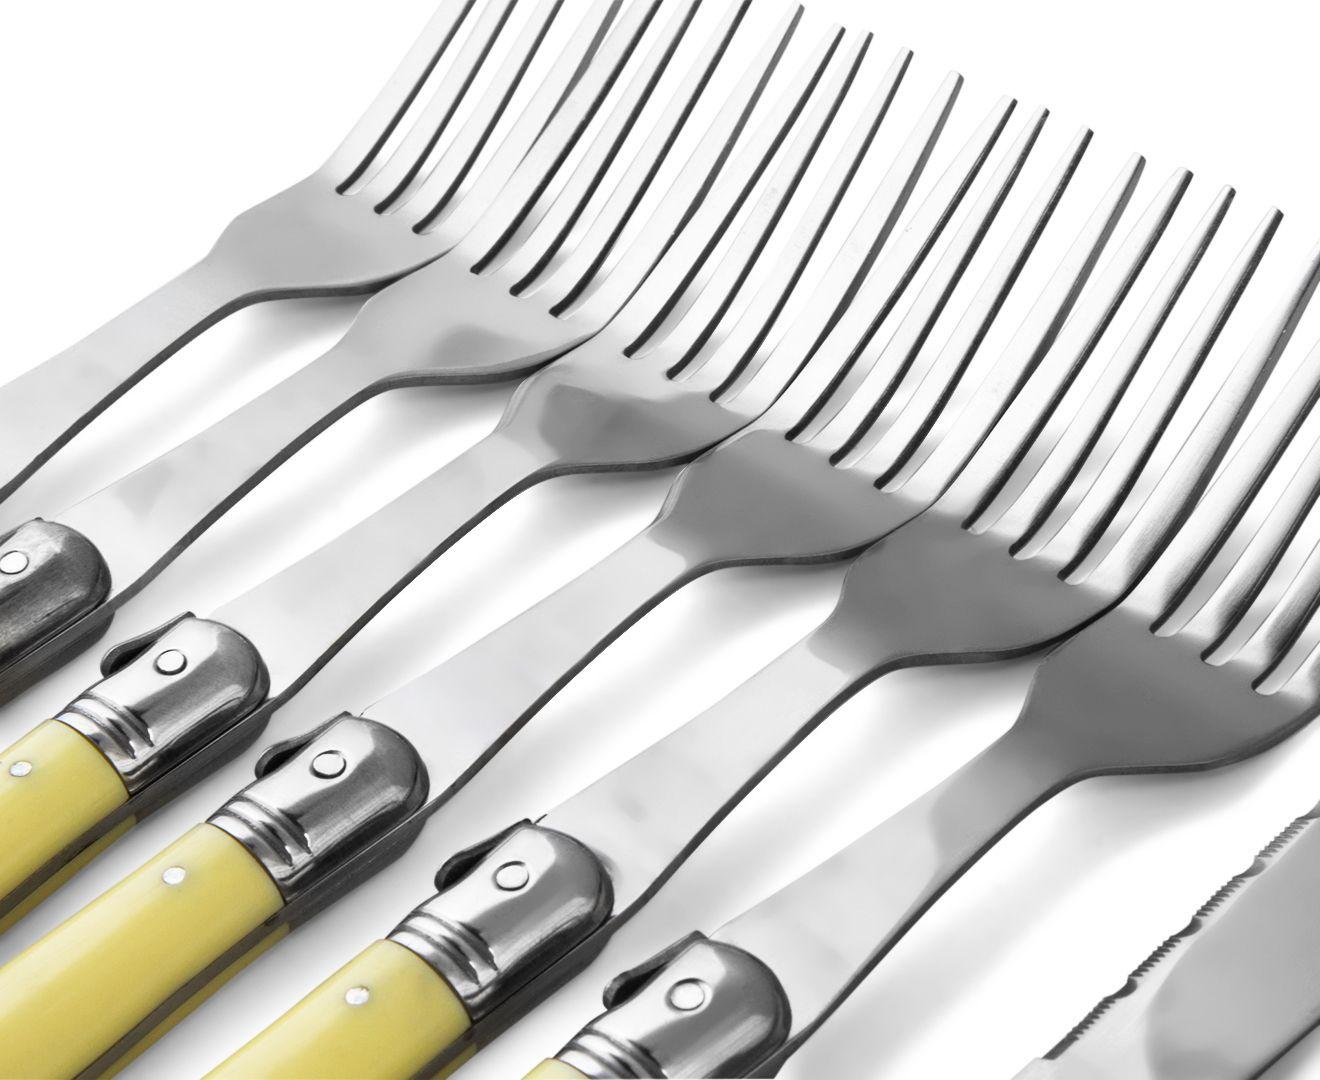 Laguiole 12-Piece Steak Knife & Fork Set